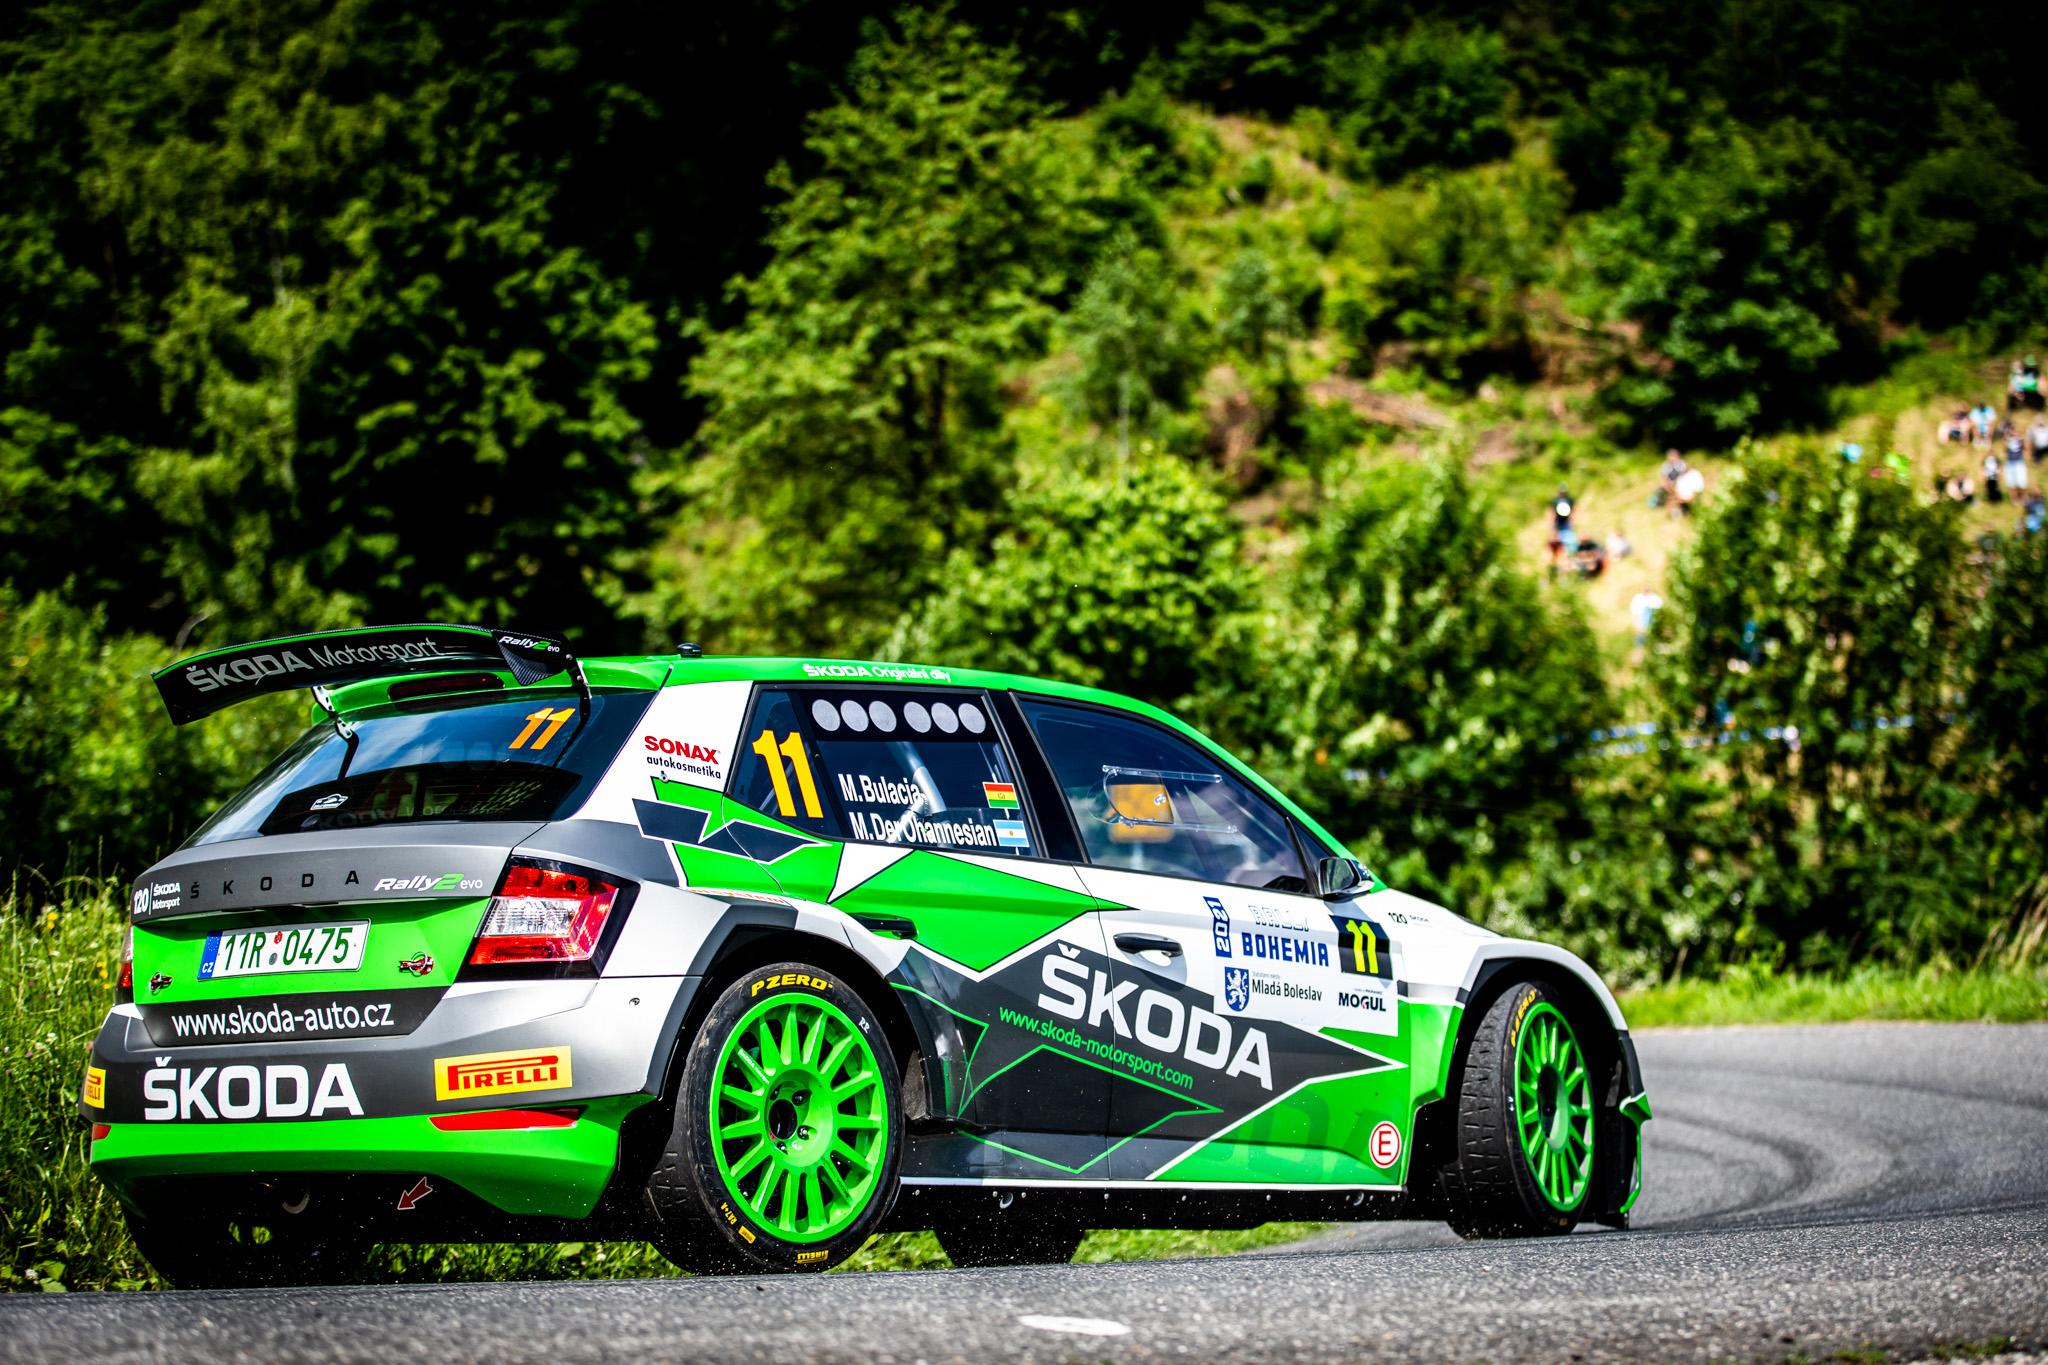 Jan Kopecký celebrates 120 years of SKODA in motorsport with ninth victory at Bohemia Rally - Image 1